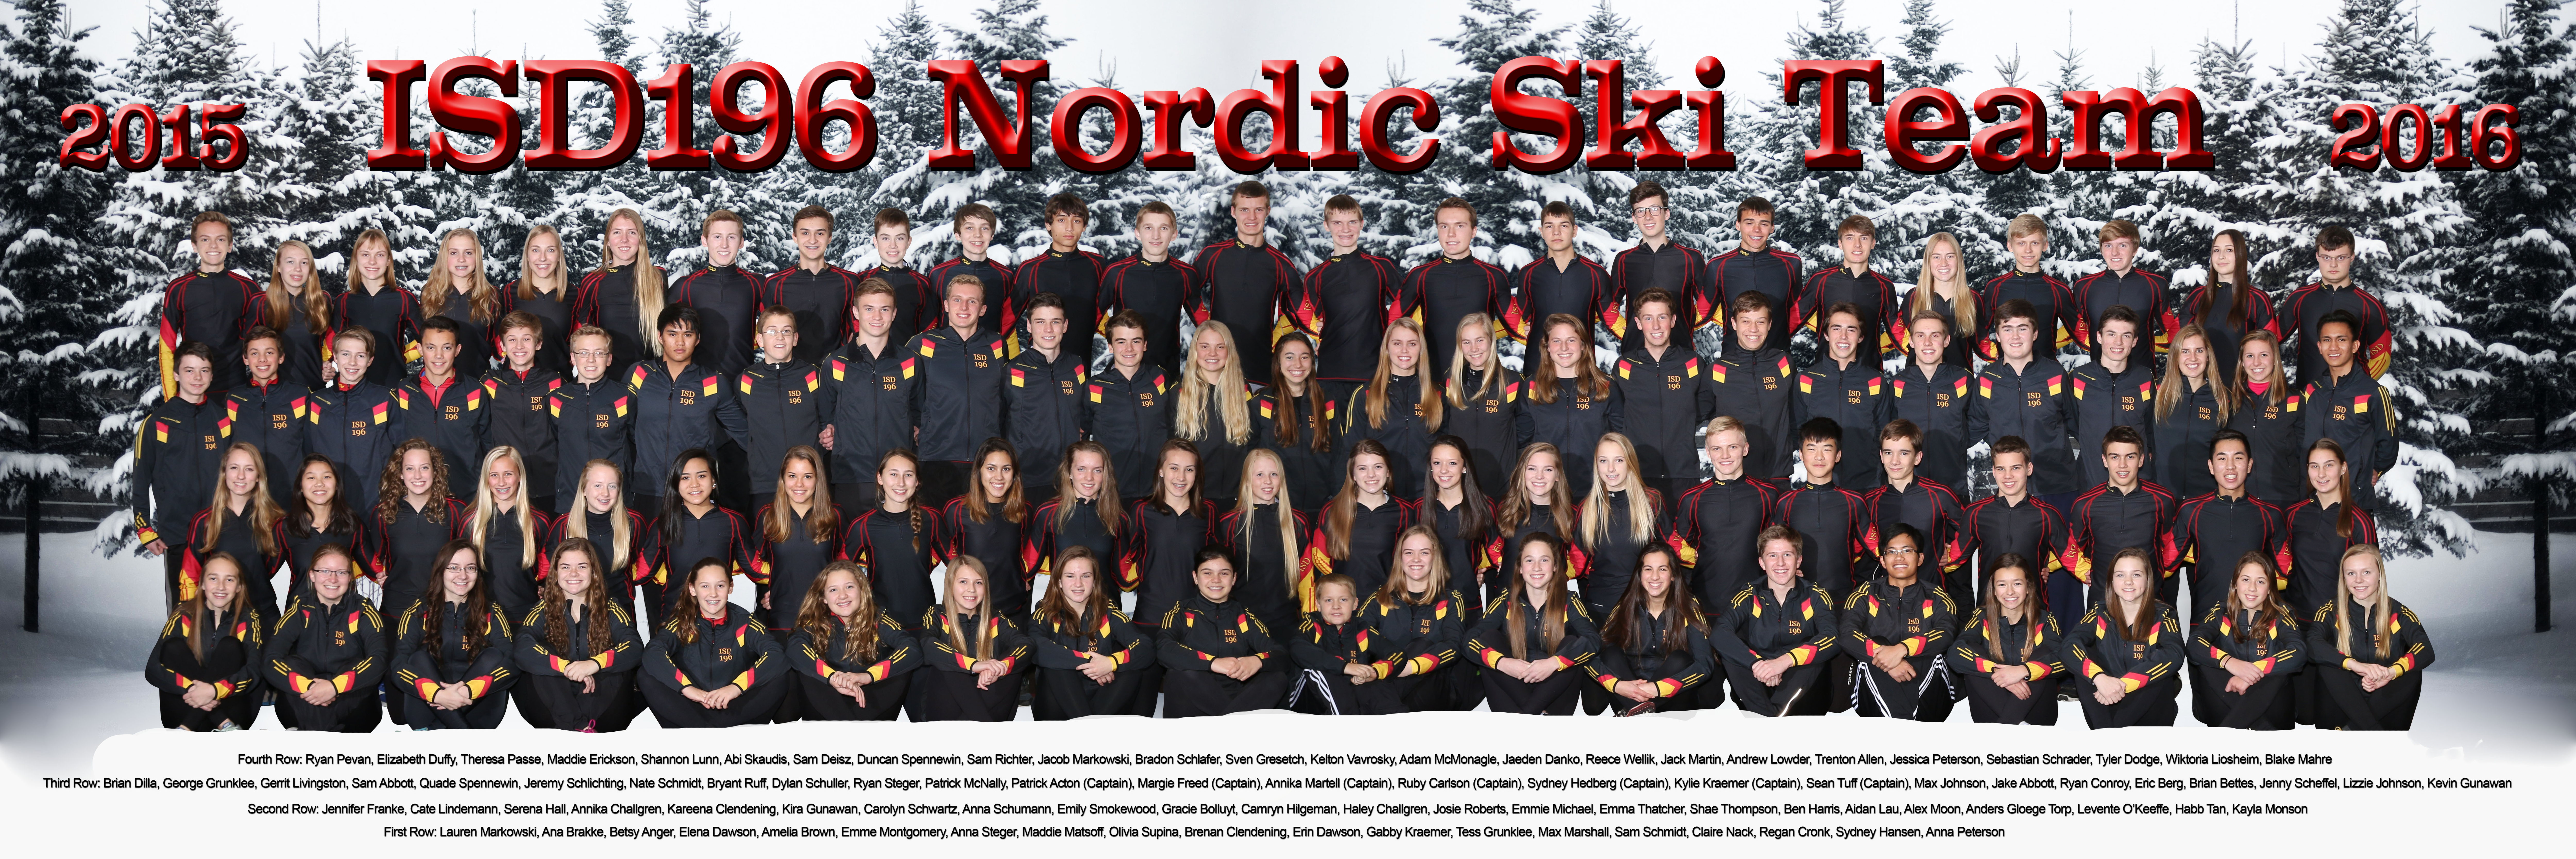 ISD 196 Nordic Ski Team